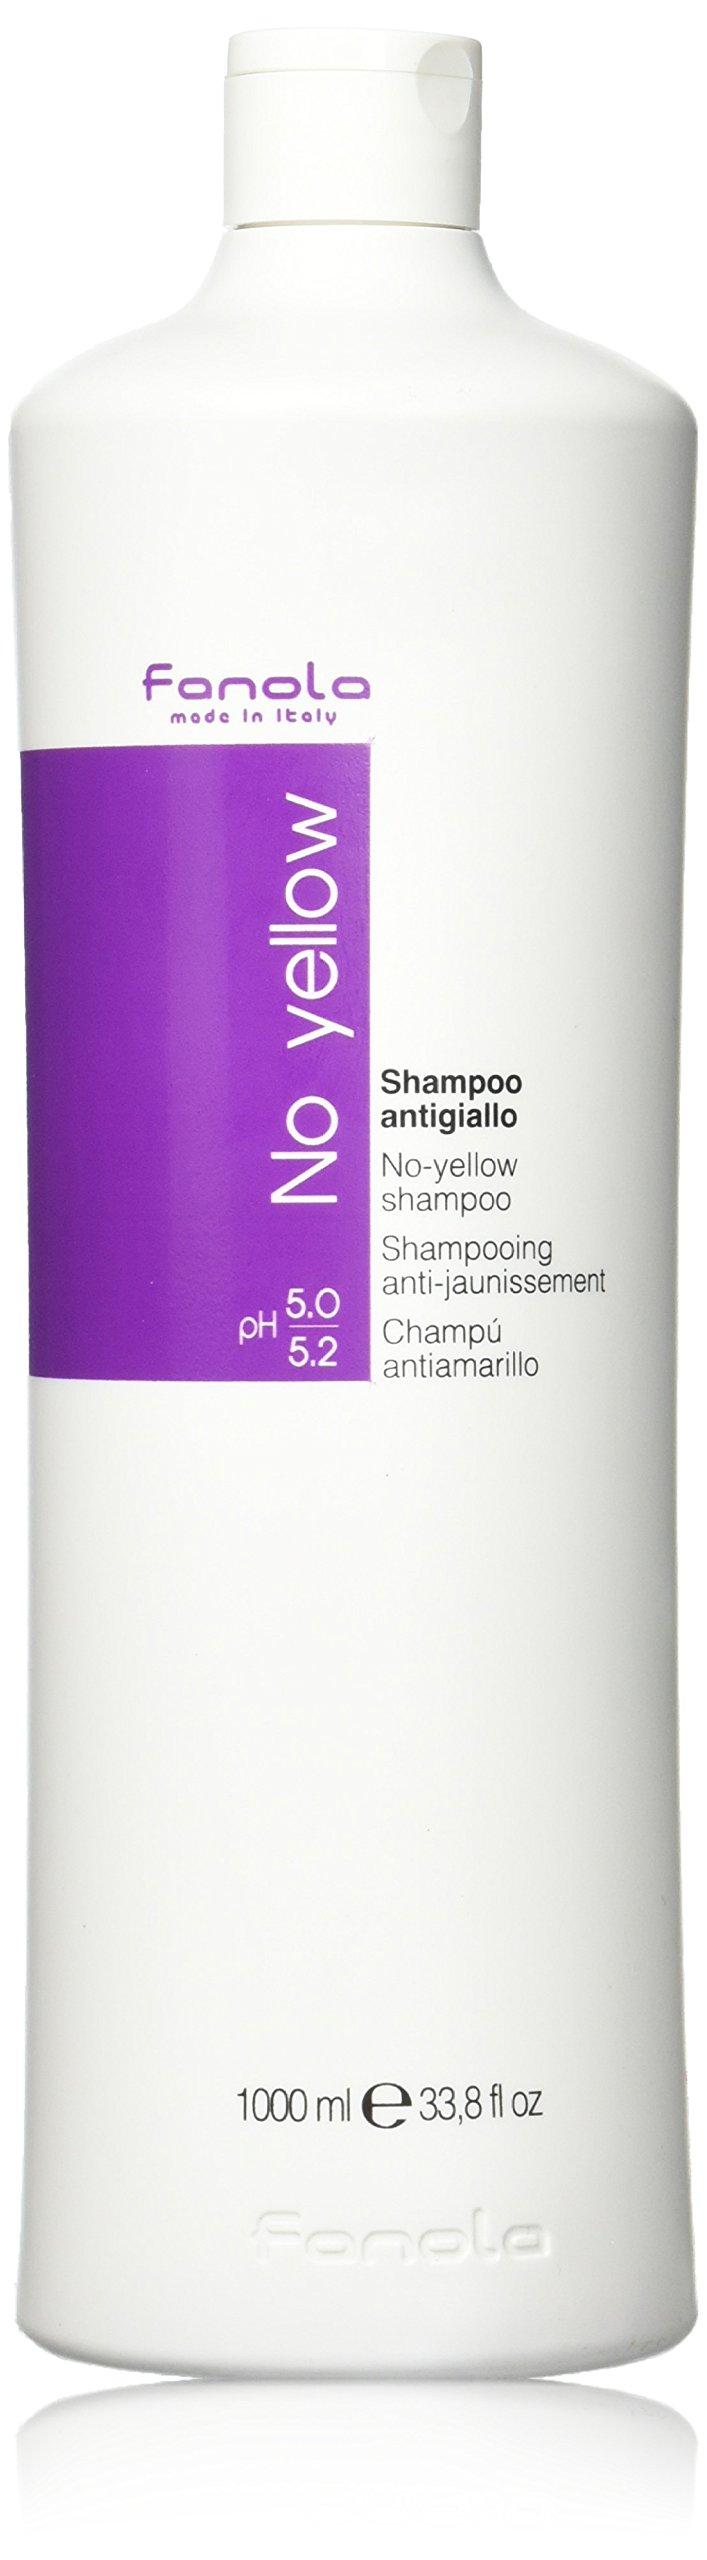 Fanola No Yellow Shampoo - Anti-Gelbstich Shampoo 12